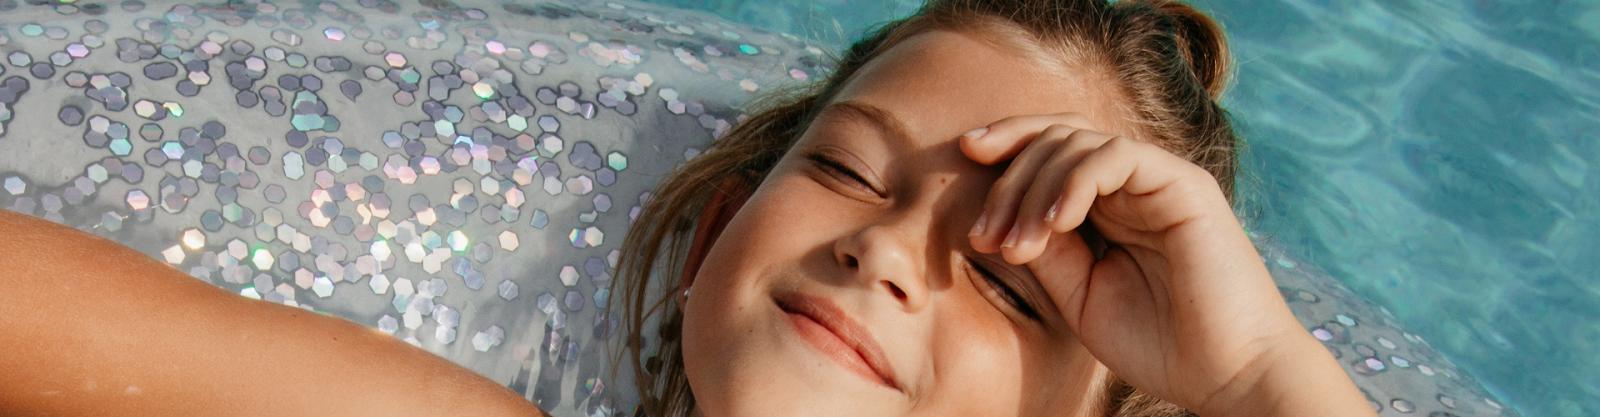 Swim Spas & Kid Fun